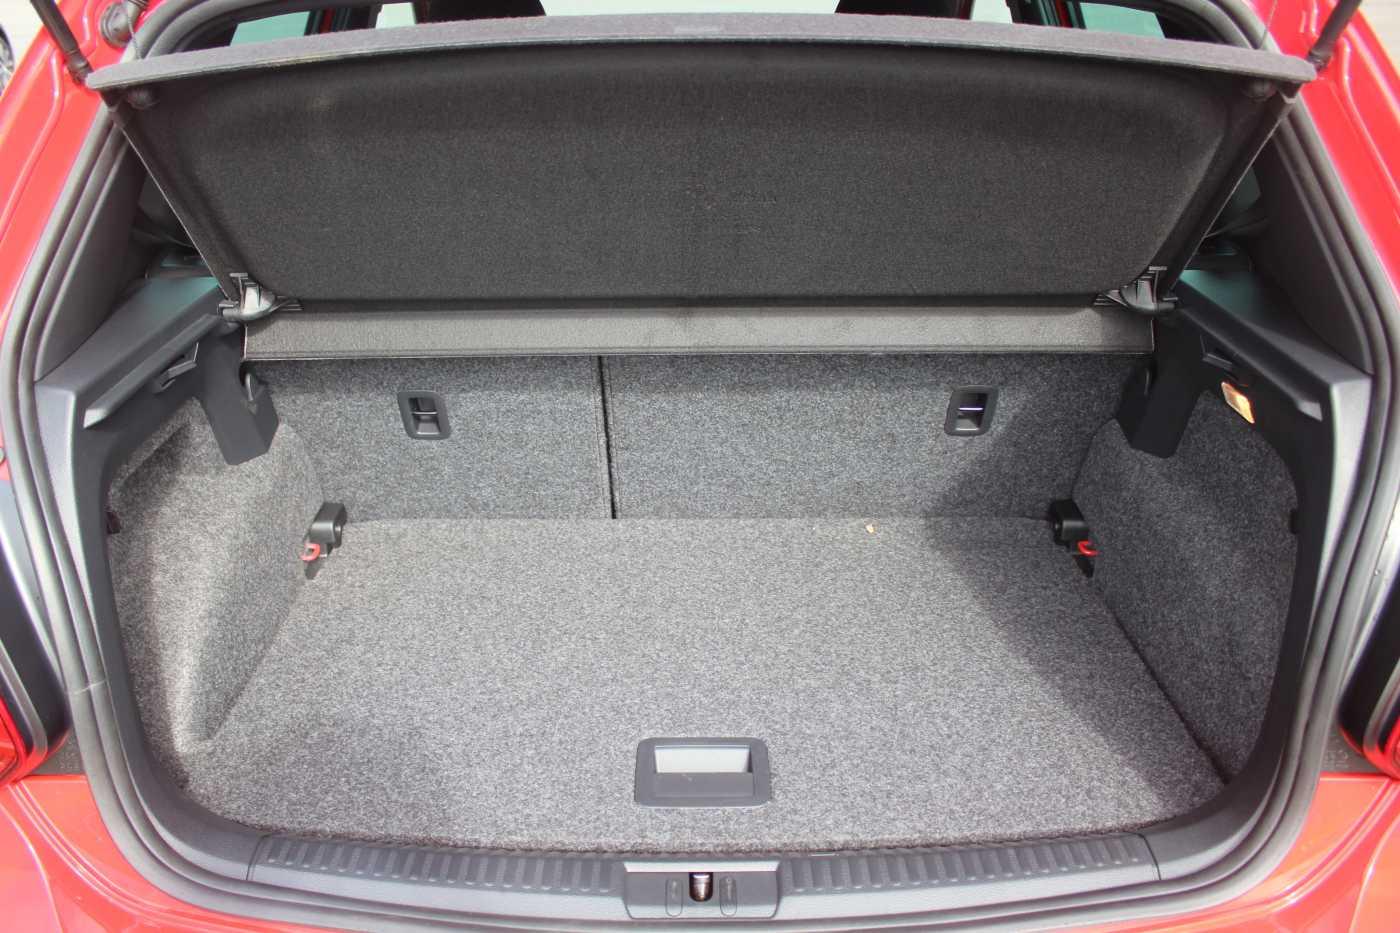 Volkswagen Polo Hatchback 1.2 TSI R Line 5dr